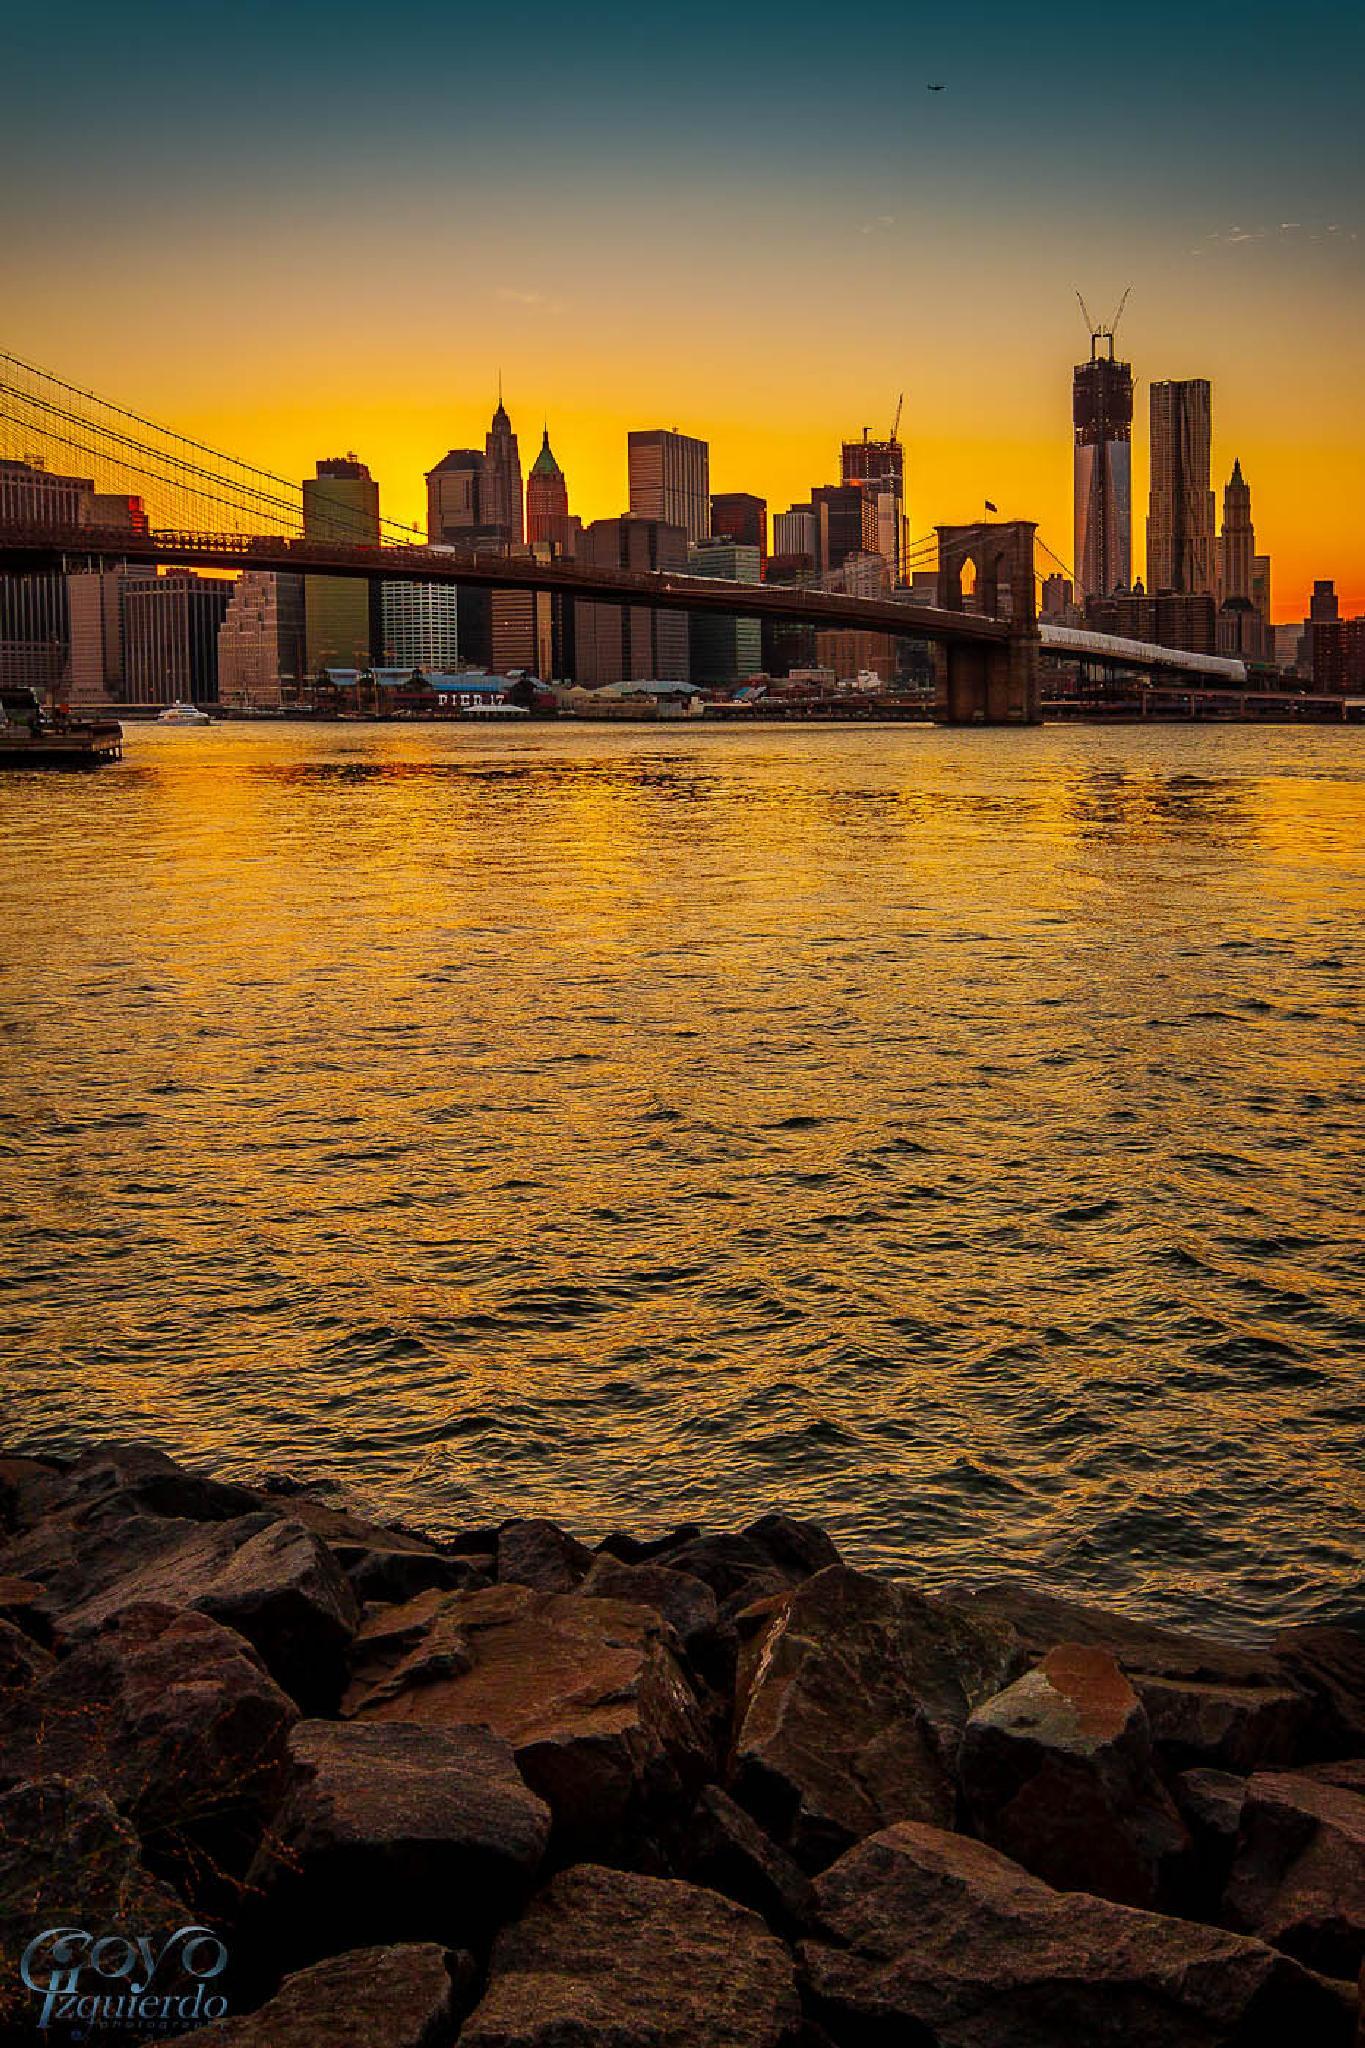 Skyline New York, Brooklyn shore by espaciosyluz